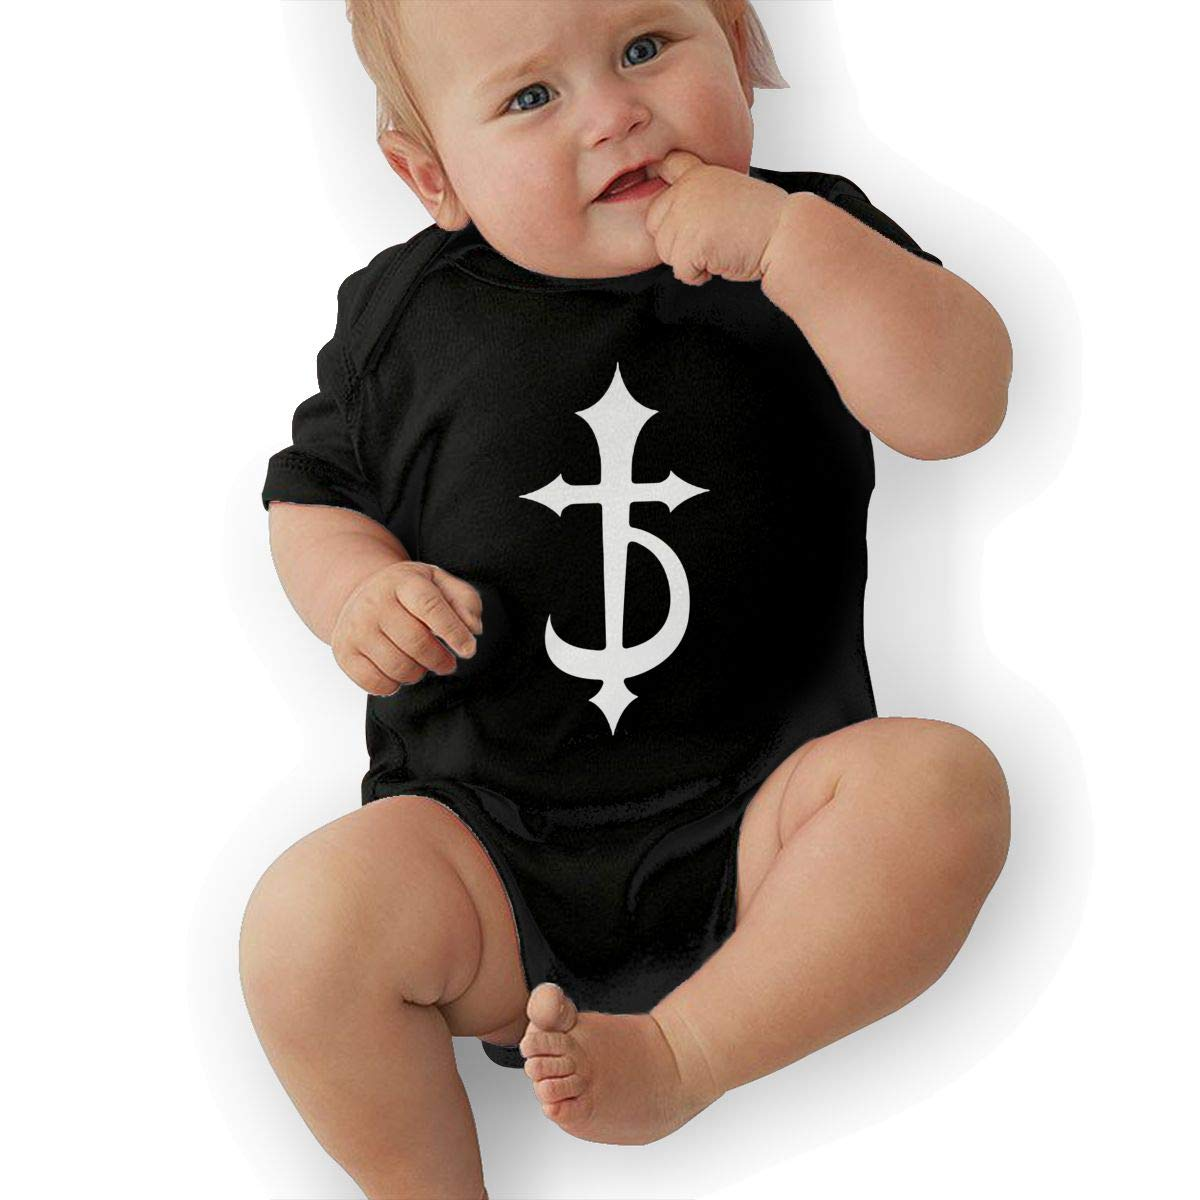 LuckyTagy DevilDriver Logo Unisex Fashion Newborn Baby Romper Baby GirlBodysuit Black